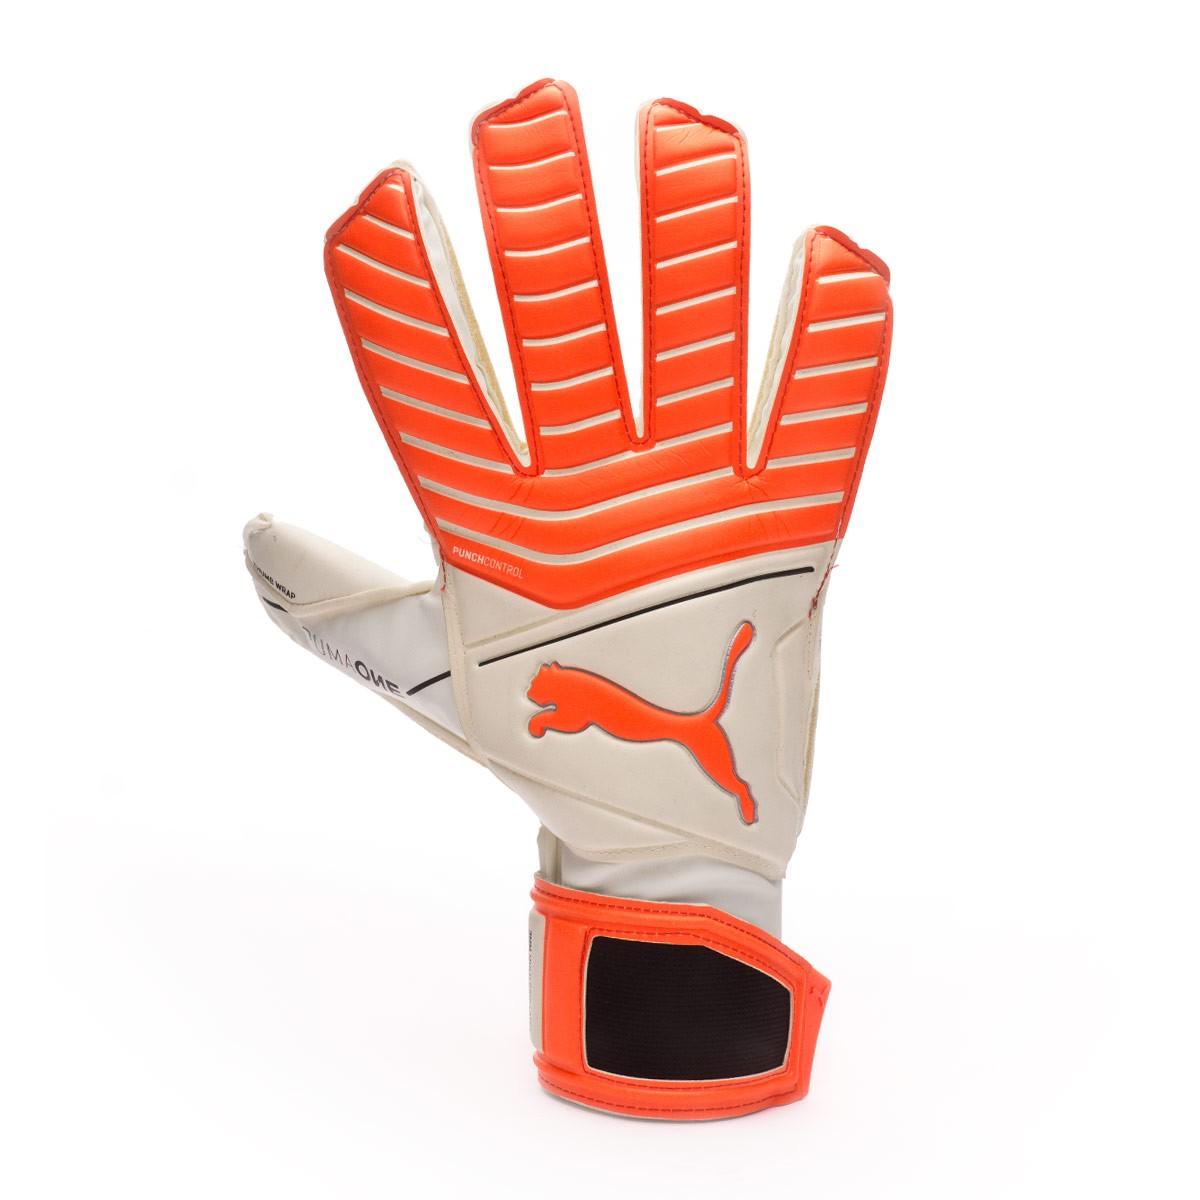 8f406de7a4d1 Glove Puma One Grip 17.3 RC Puma White-Red Blast-Puma Black-Silver -  Football store Fútbol Emotion